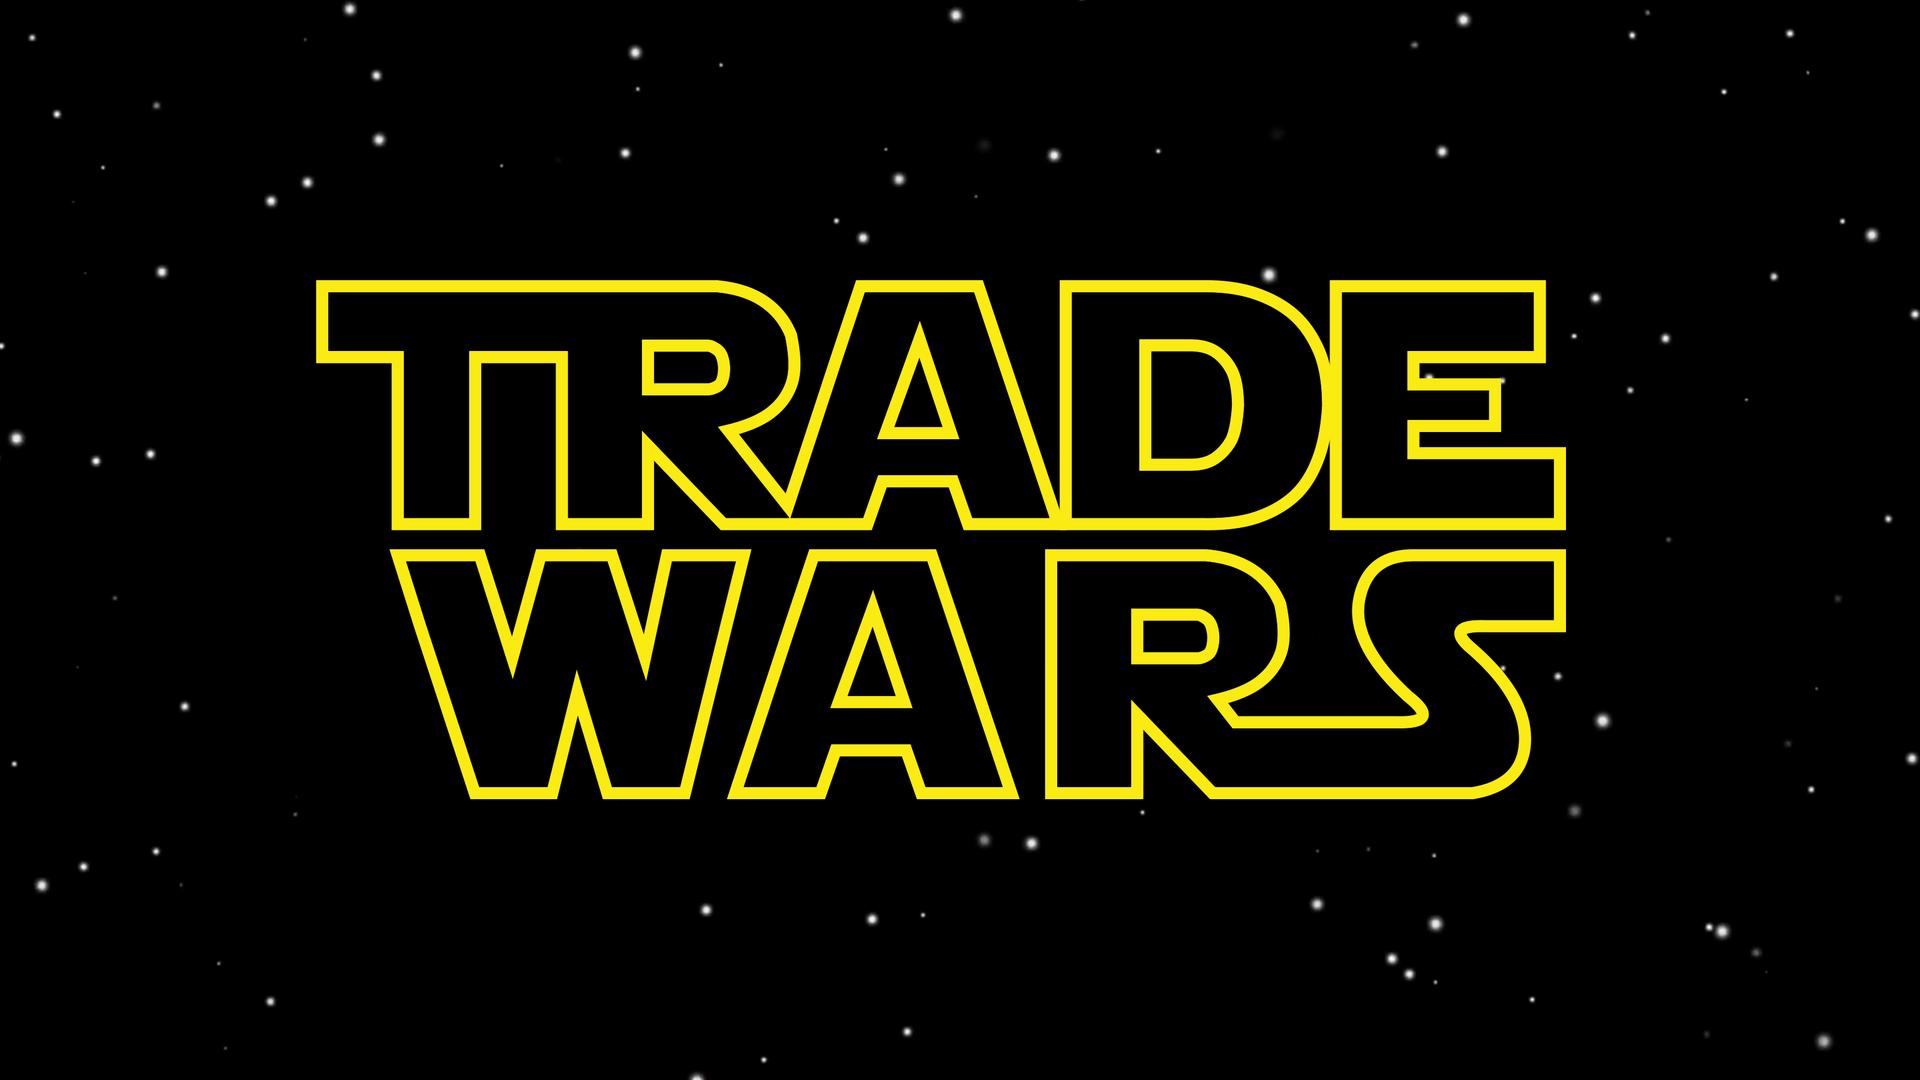 Trade Wars Capitalism Vs Communism